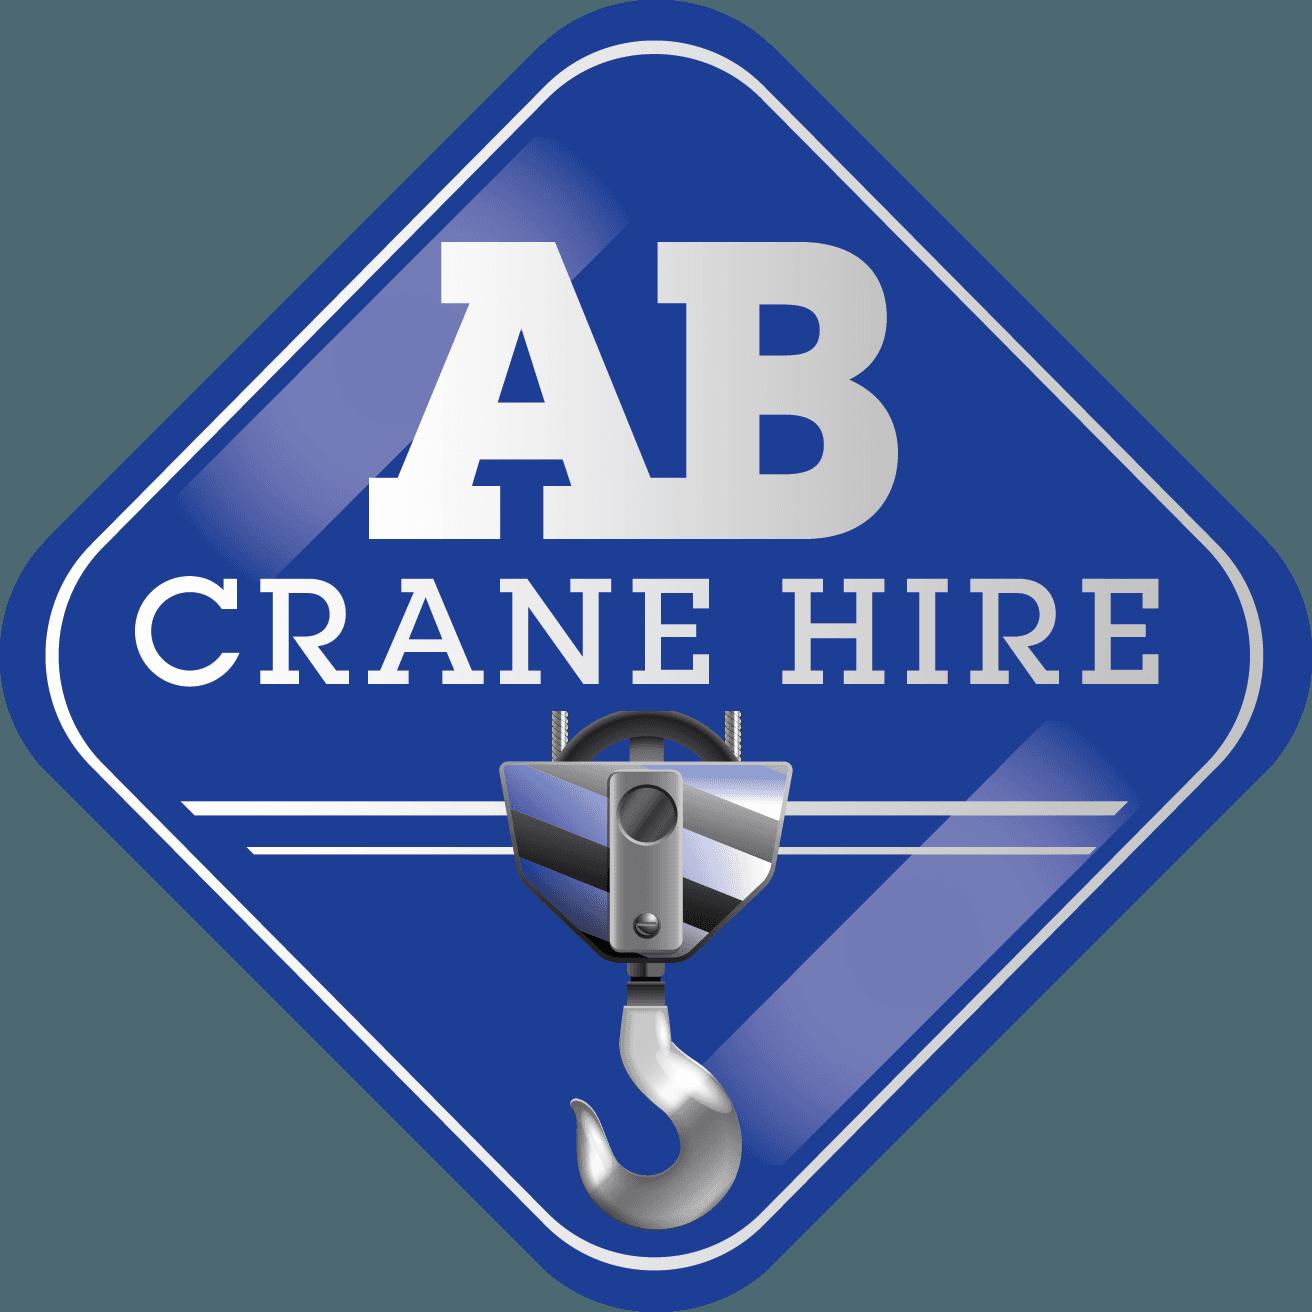 AB Crane Hire